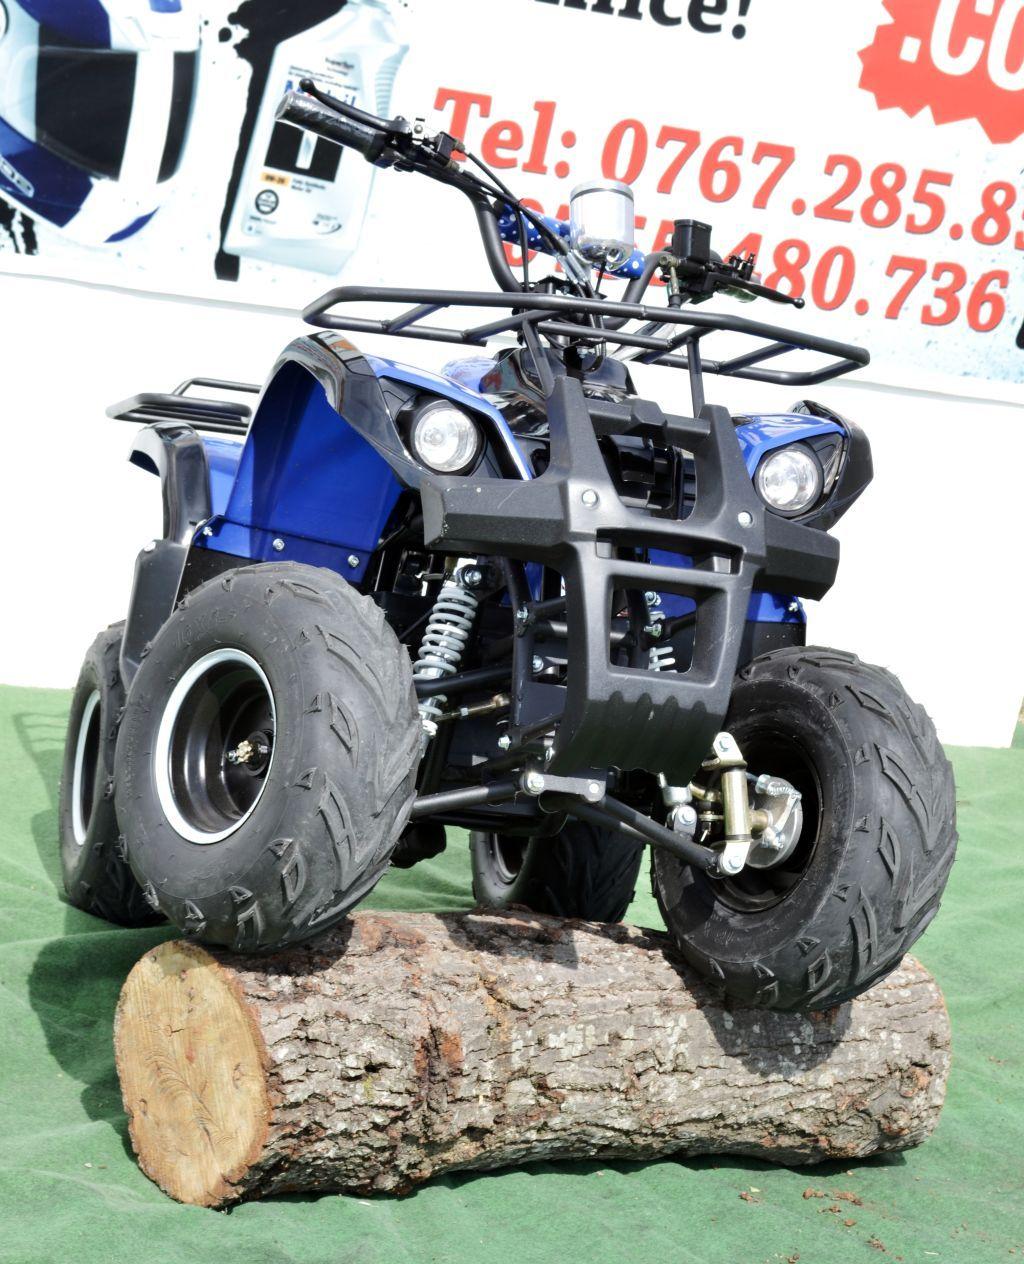 Model Nou:ATV E-Quad 1000W  X-streme